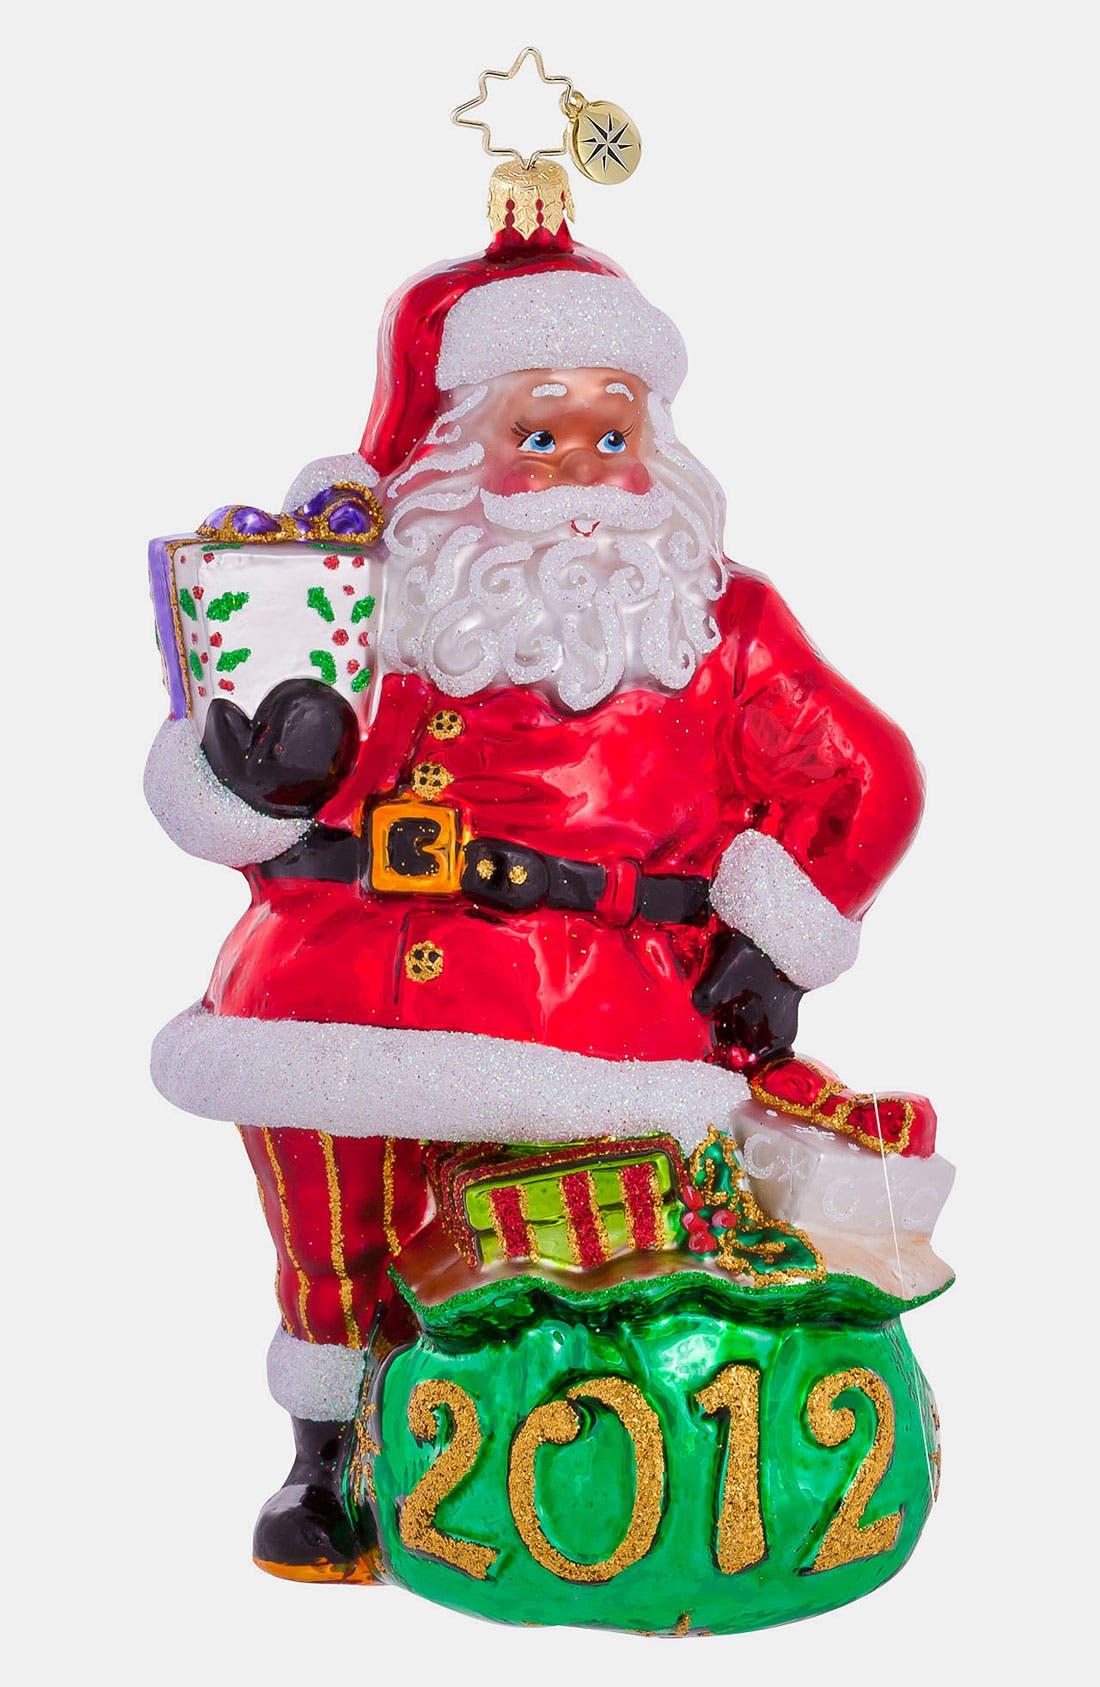 Alternate Image 1 Selected - Christopher Radko '2012 Santa' Ornament